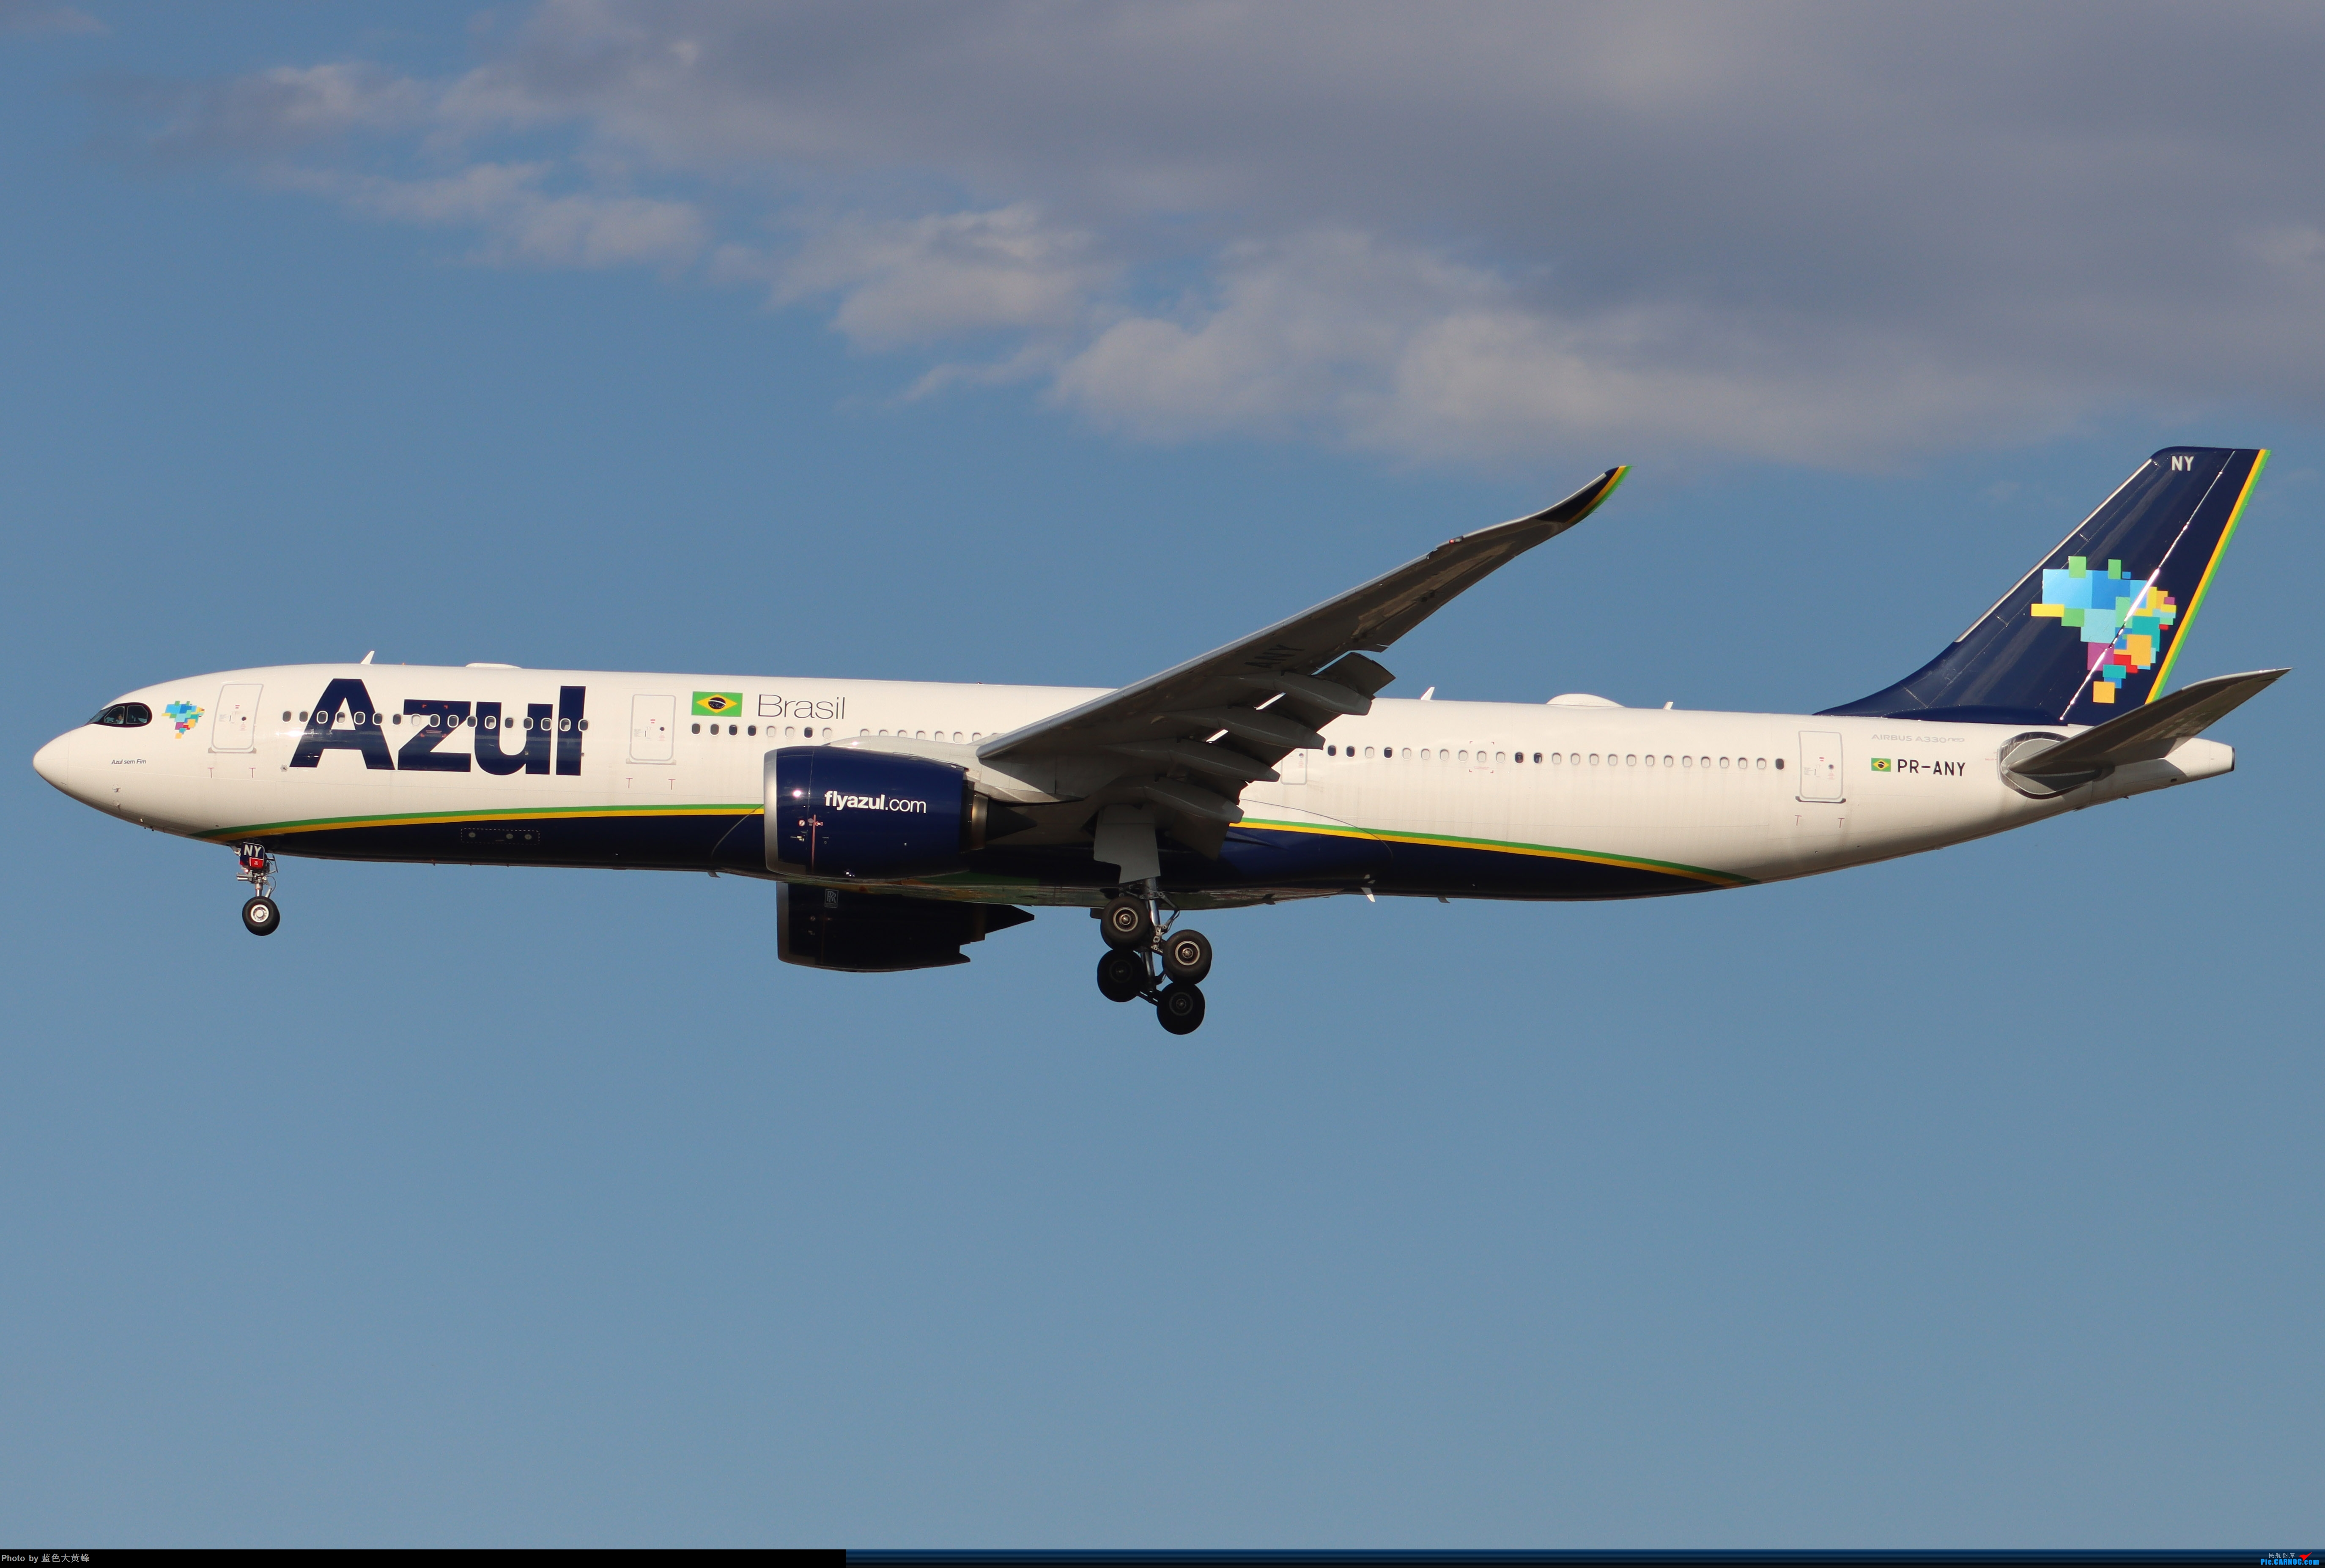 Re:[原创]PEK5.24随拍 AIRBUS A330-941NEO PR-ANY 中国北京首都国际机场